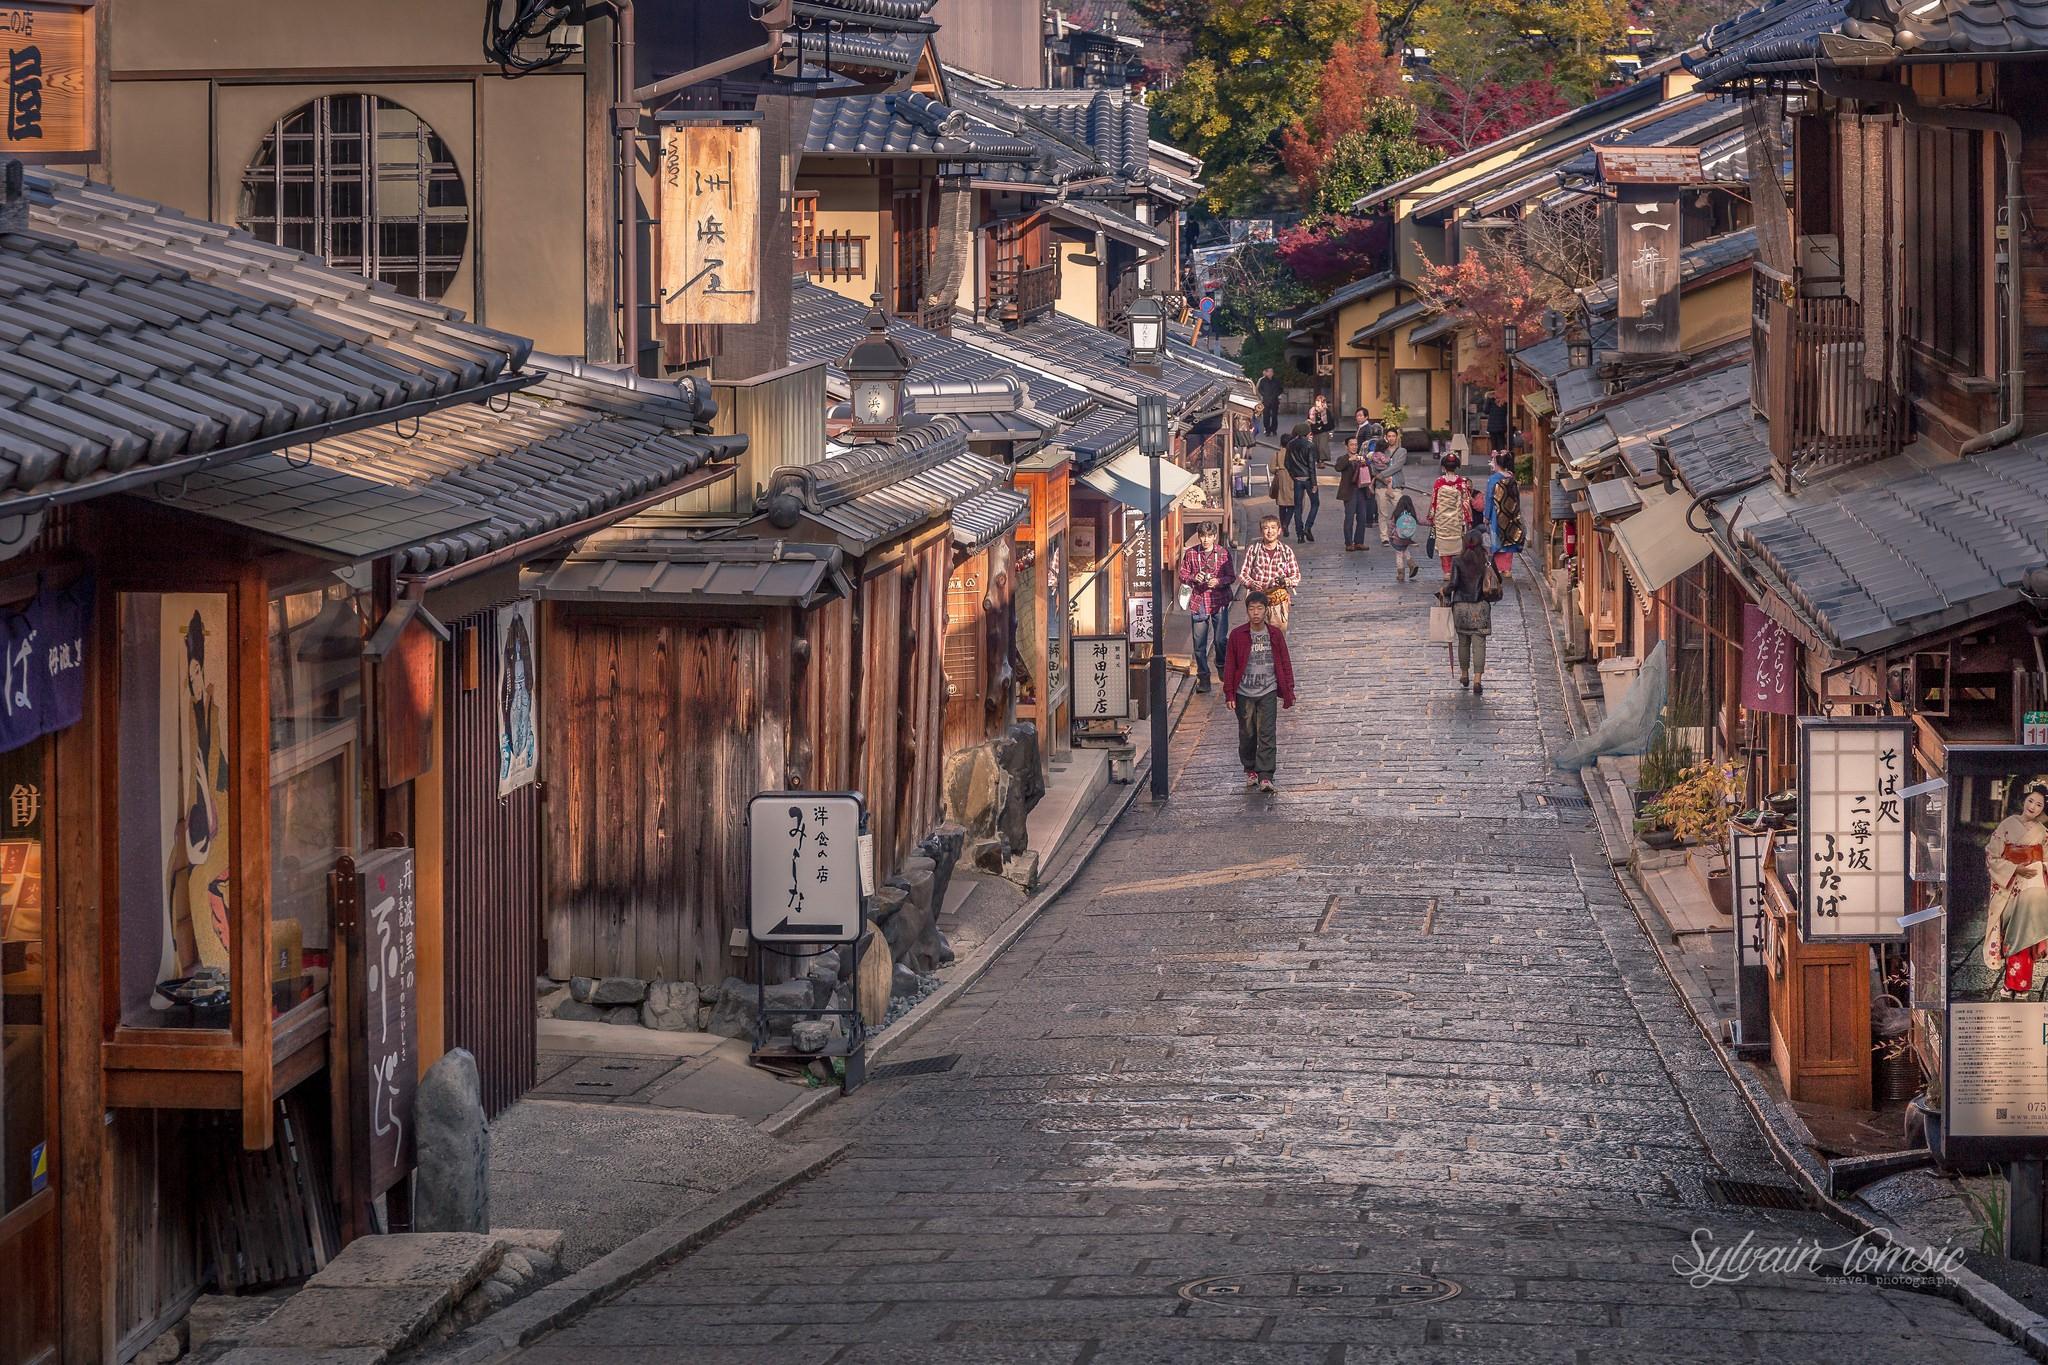 Take me to Gion. Foto de Sylvain Tomsic